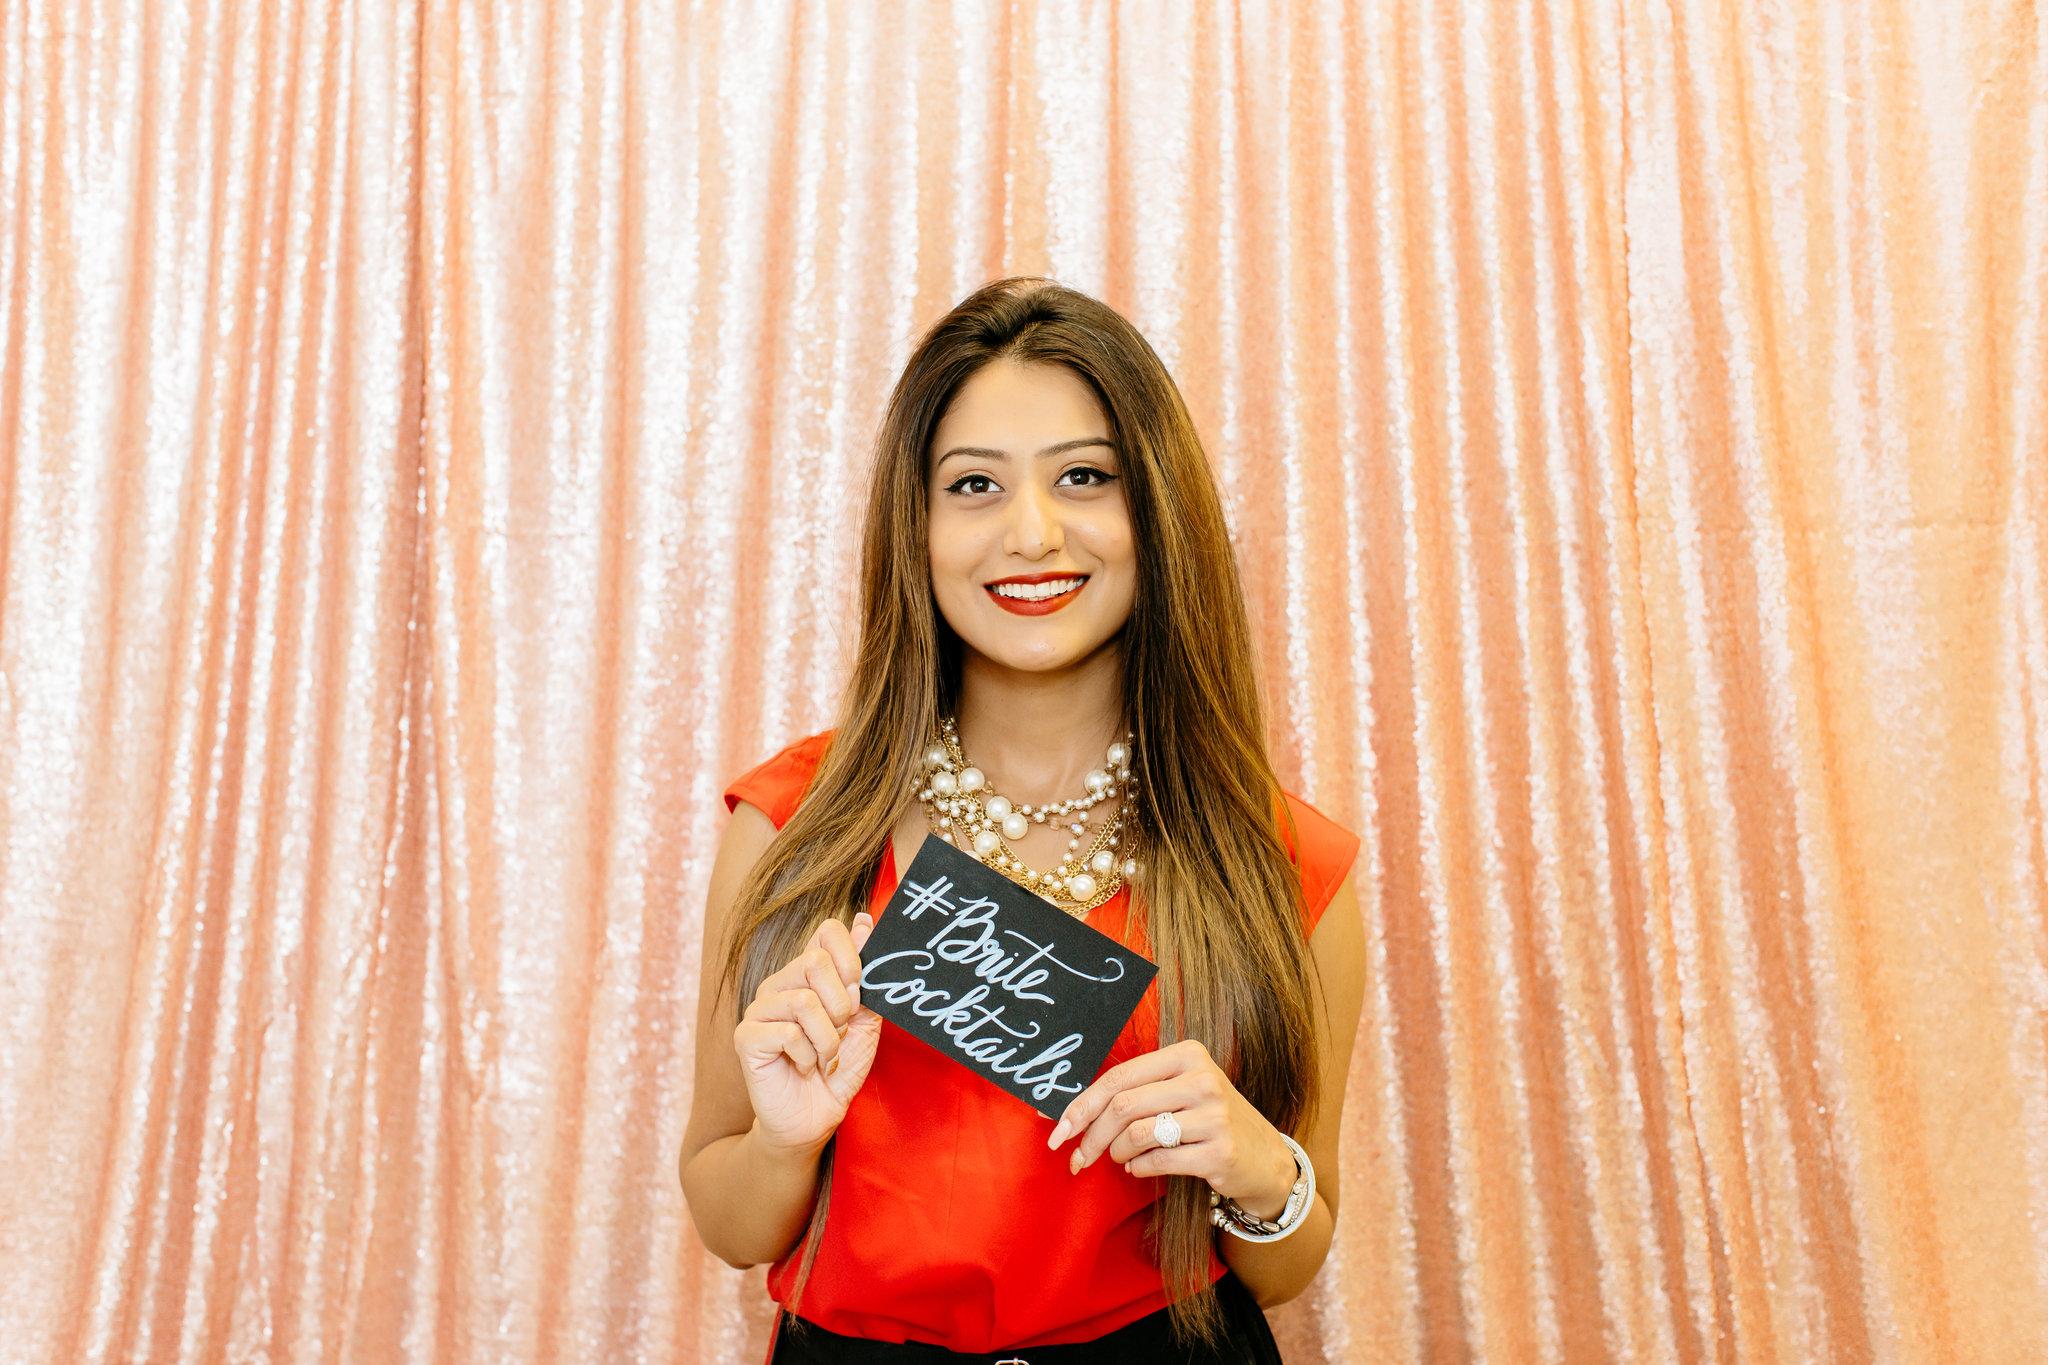 Alexa-Vossler-Photo_Dallas-Event-Photographer_Brite-Bar-Beauty-2018-Lipstick-Launch-Party-50.jpg